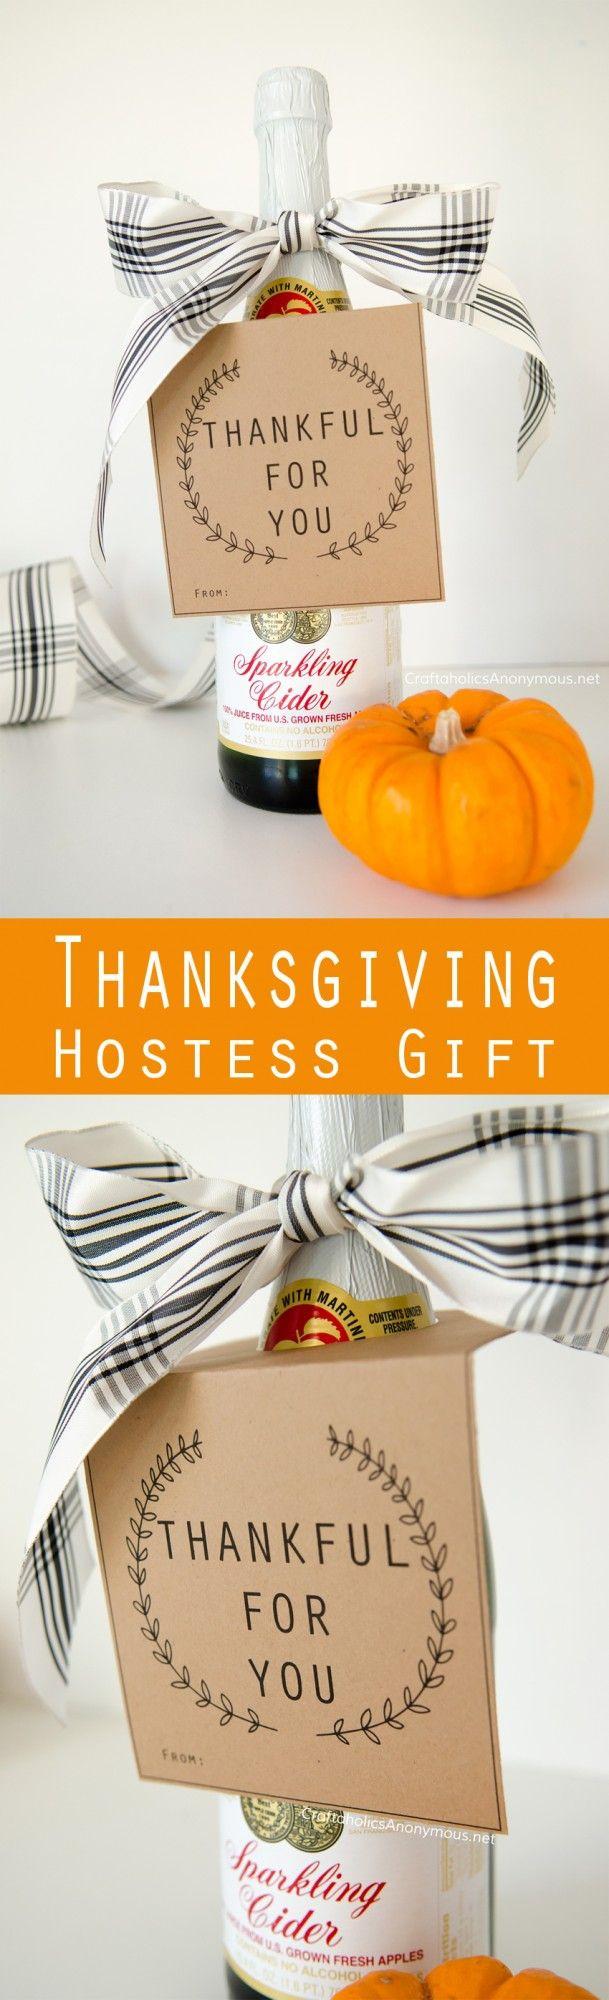 Thanksgiving Hostess Gift Ideas Homemade  The 25 best Thanksgiving hostess ts ideas on Pinterest